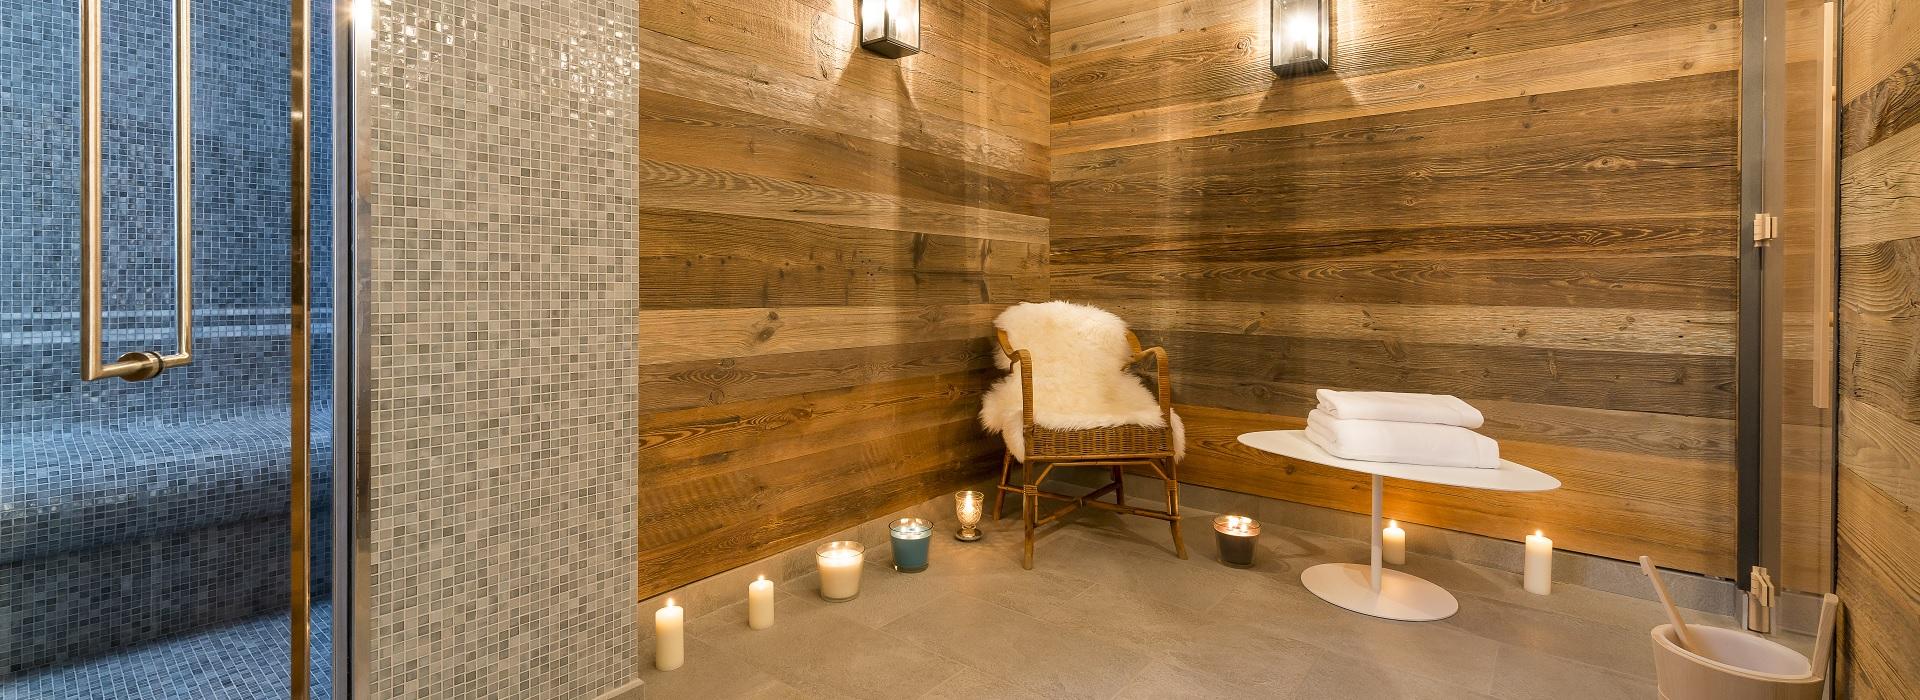 0010-2-TristanShu redim 1920x700 Slide Hamma et sauna